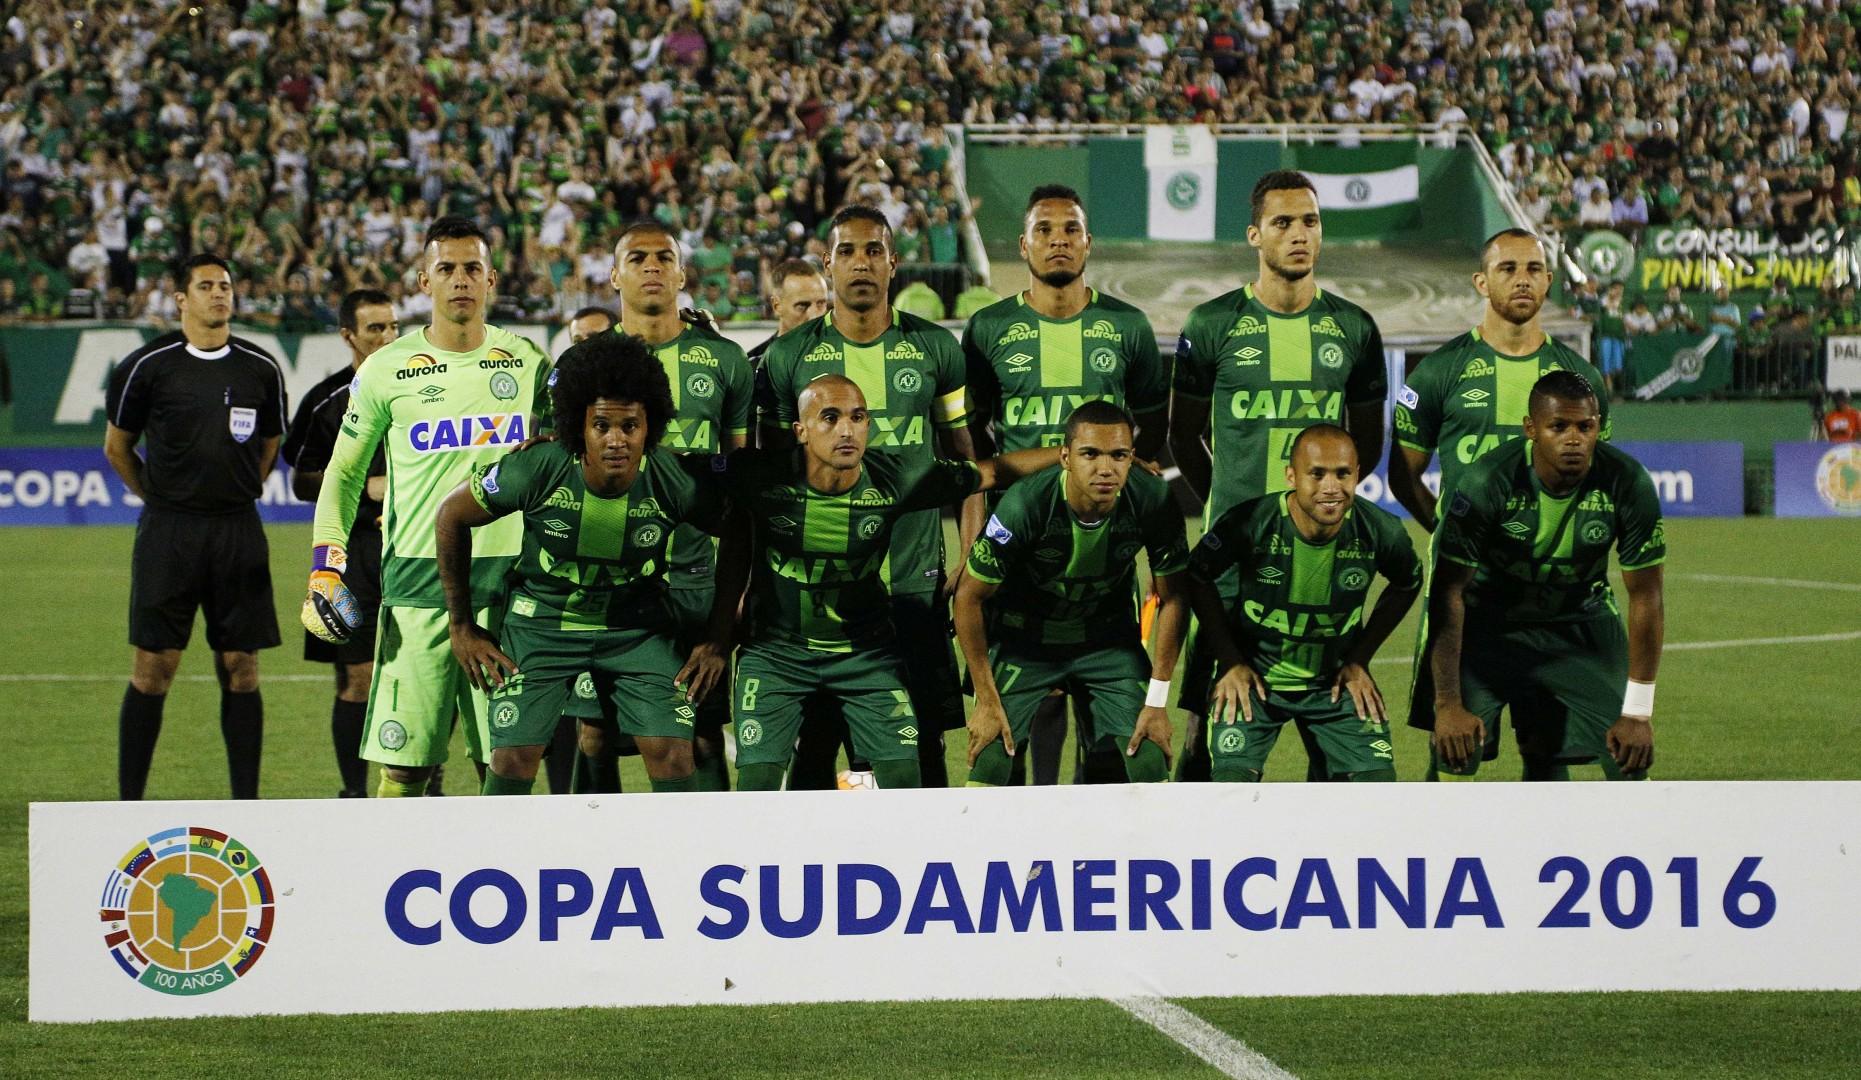 Ekipa brazilskega nogometnega kluba Chapecoense pred poletom (Foto: epa).